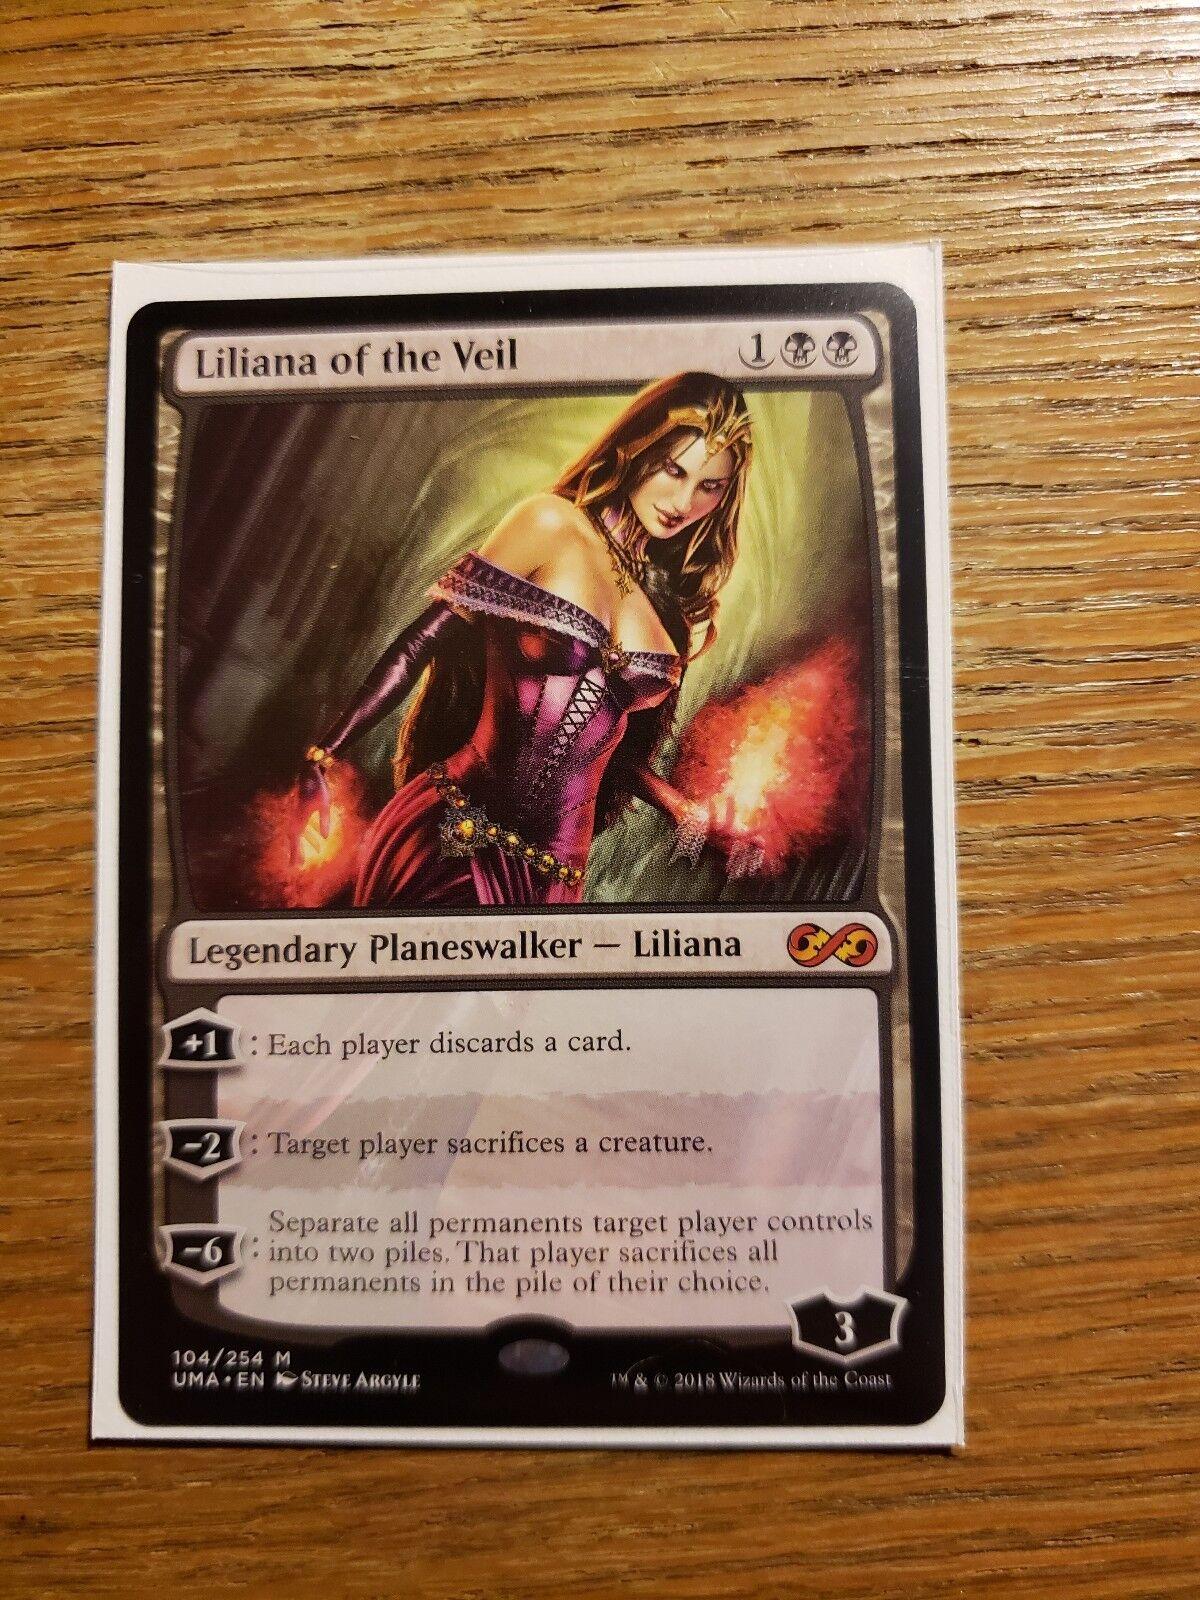 Liliana of the Veil x 1 (Ultimate Masters) MTG (Mint)